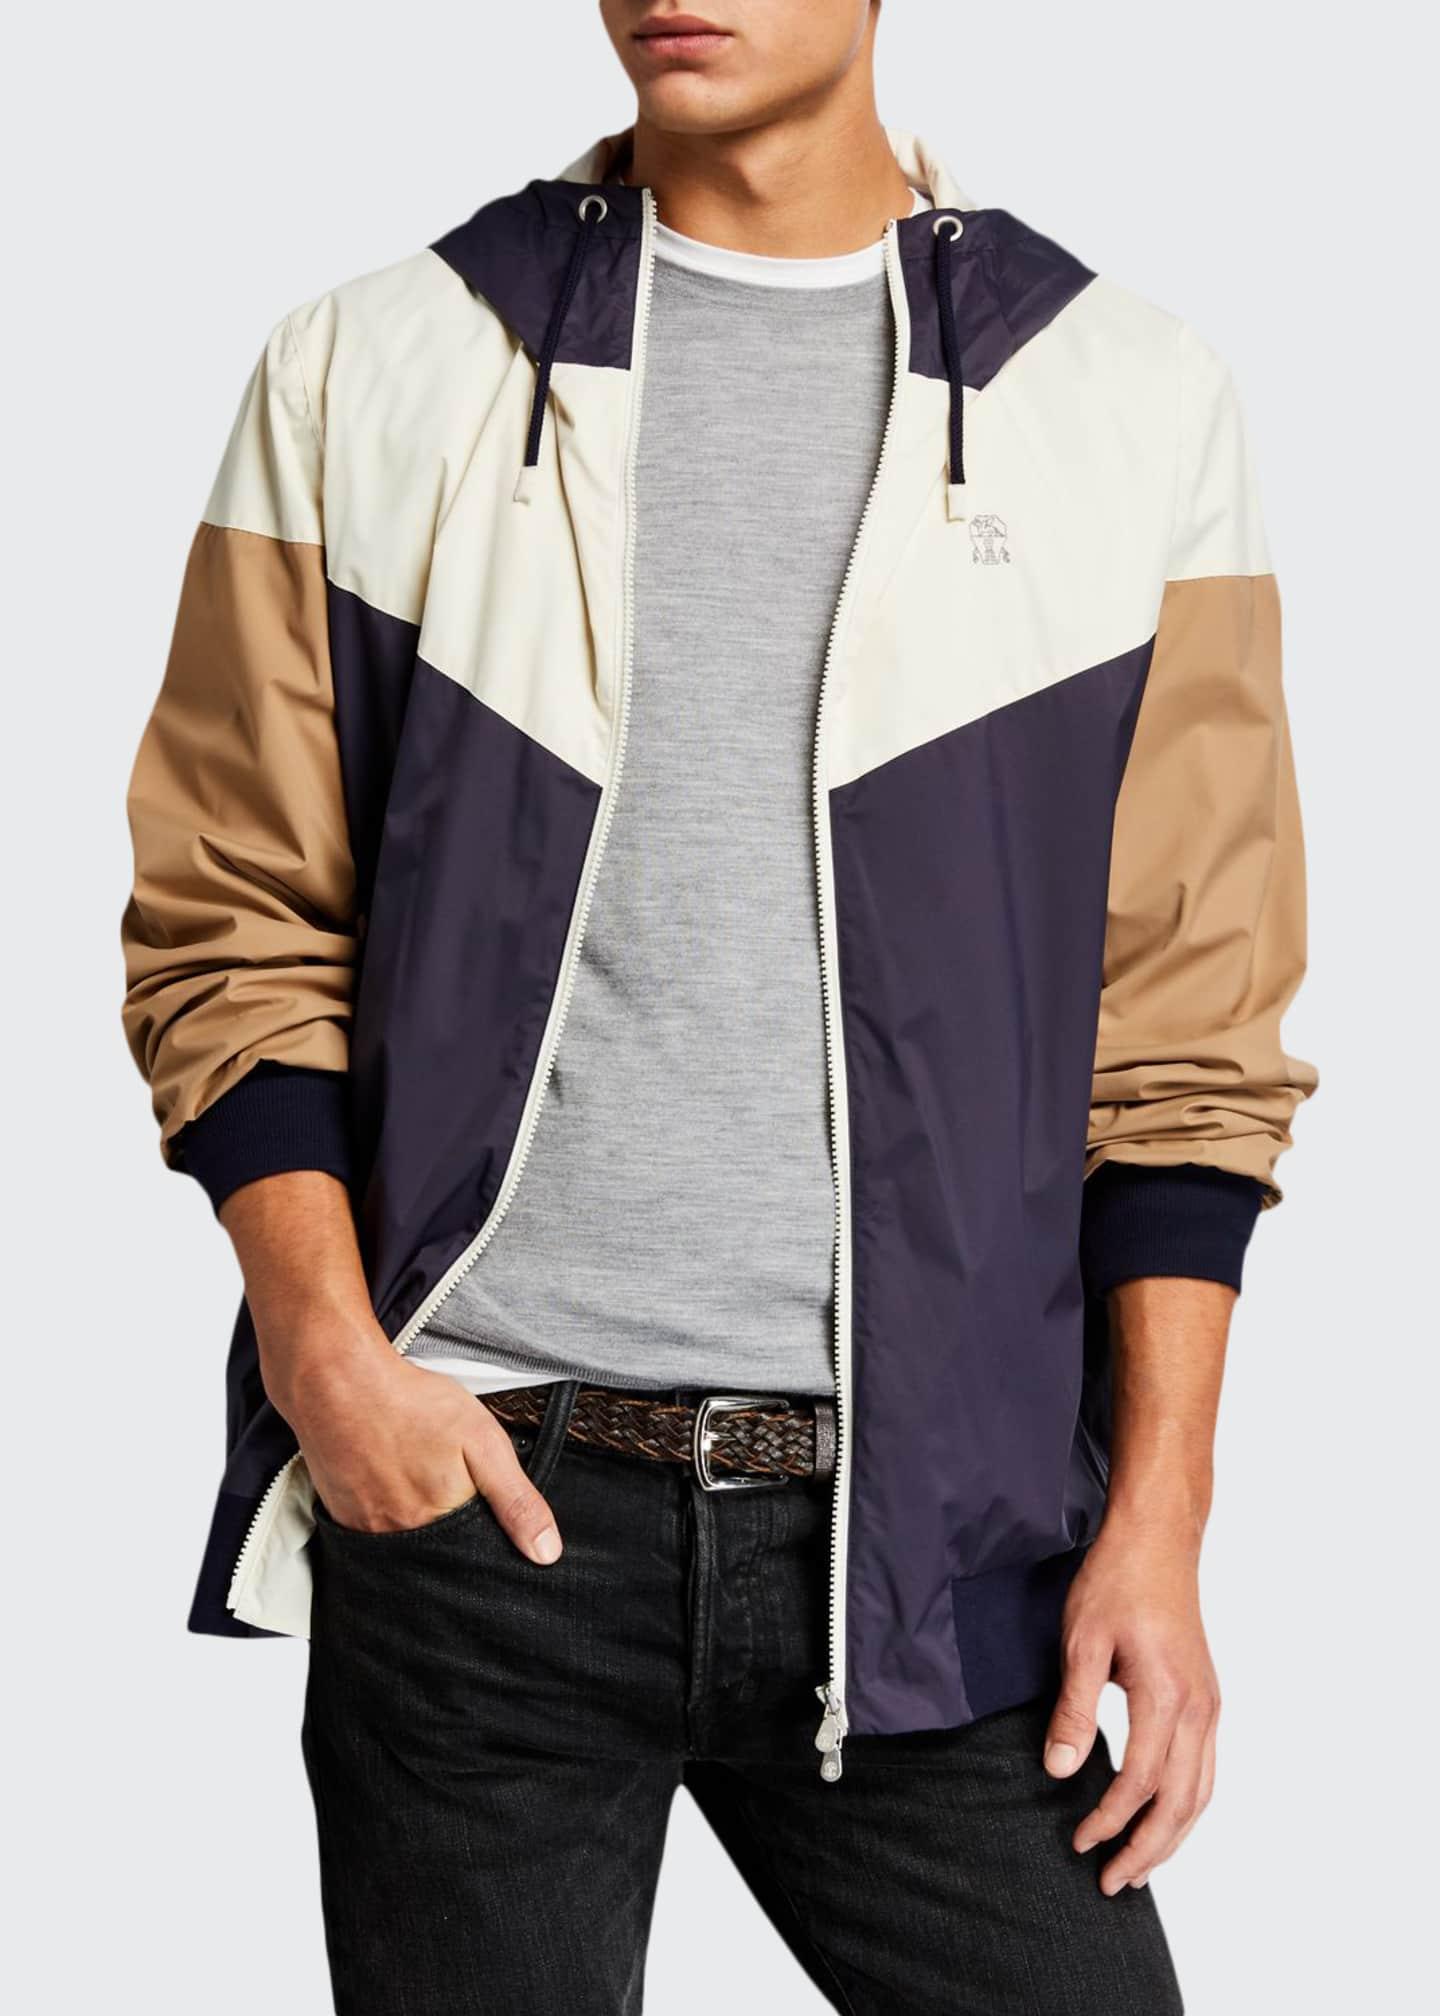 Brunello Cucinelli Men's Spa Colorblock Nylon Wind Jacket